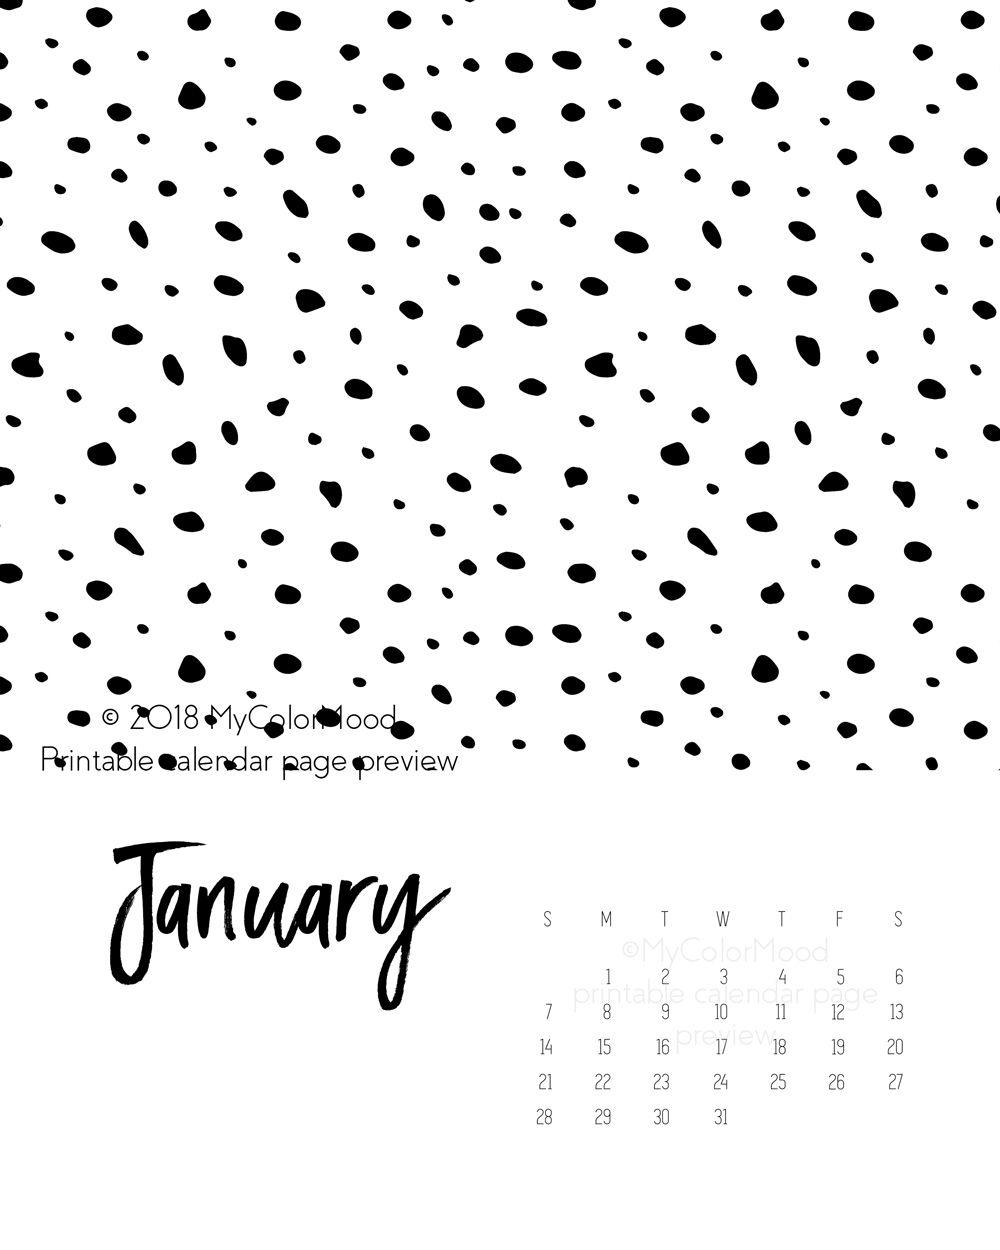 downloadable 2018 calendar